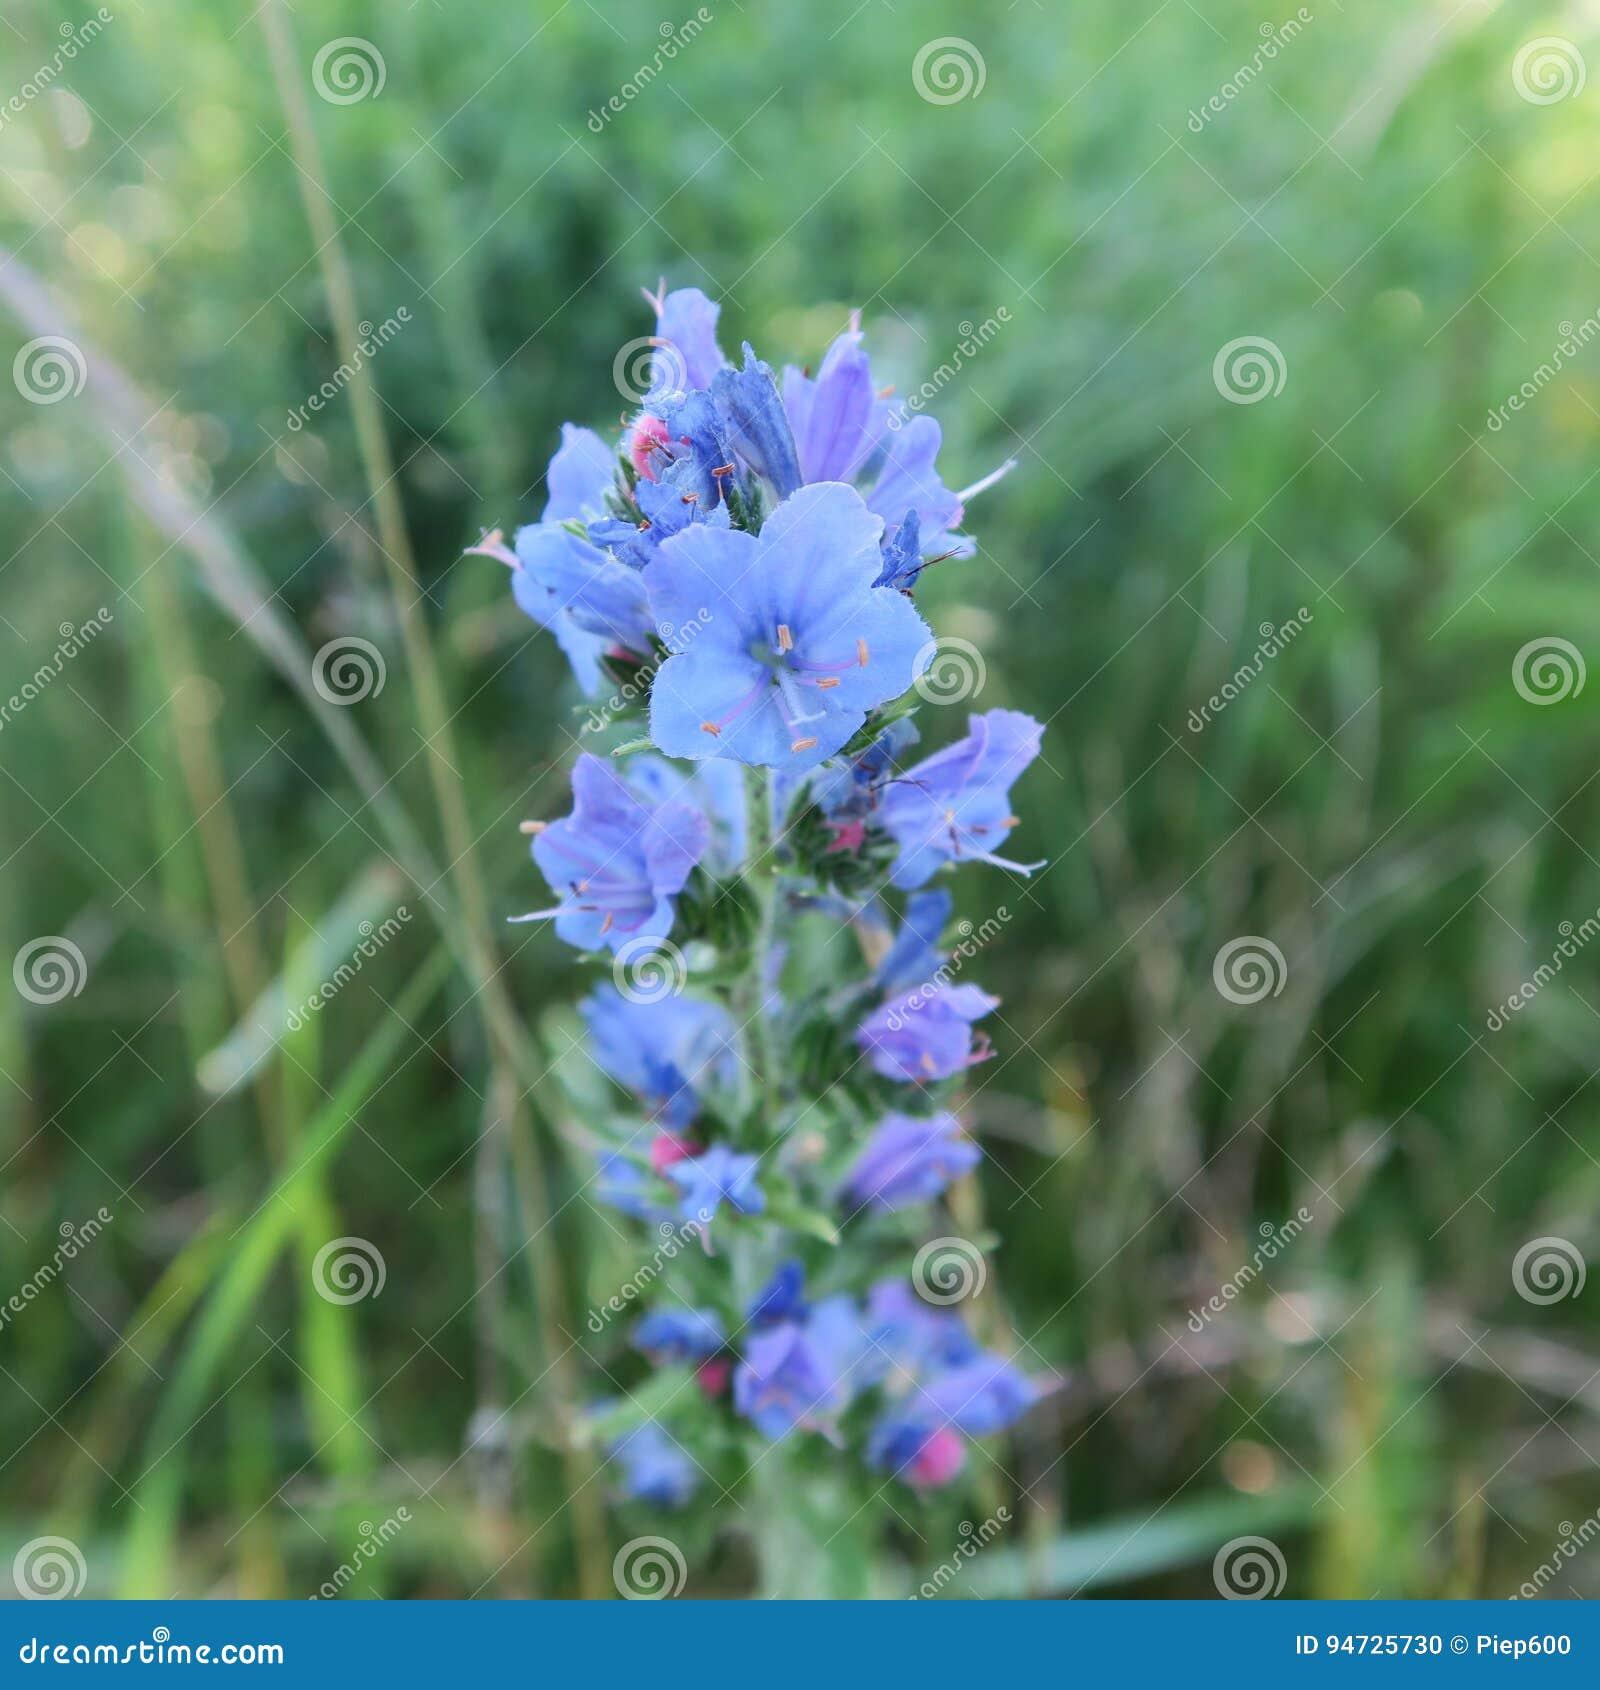 Echium Vulgare Ordinary Snakehead A Blue Flowering Perennial